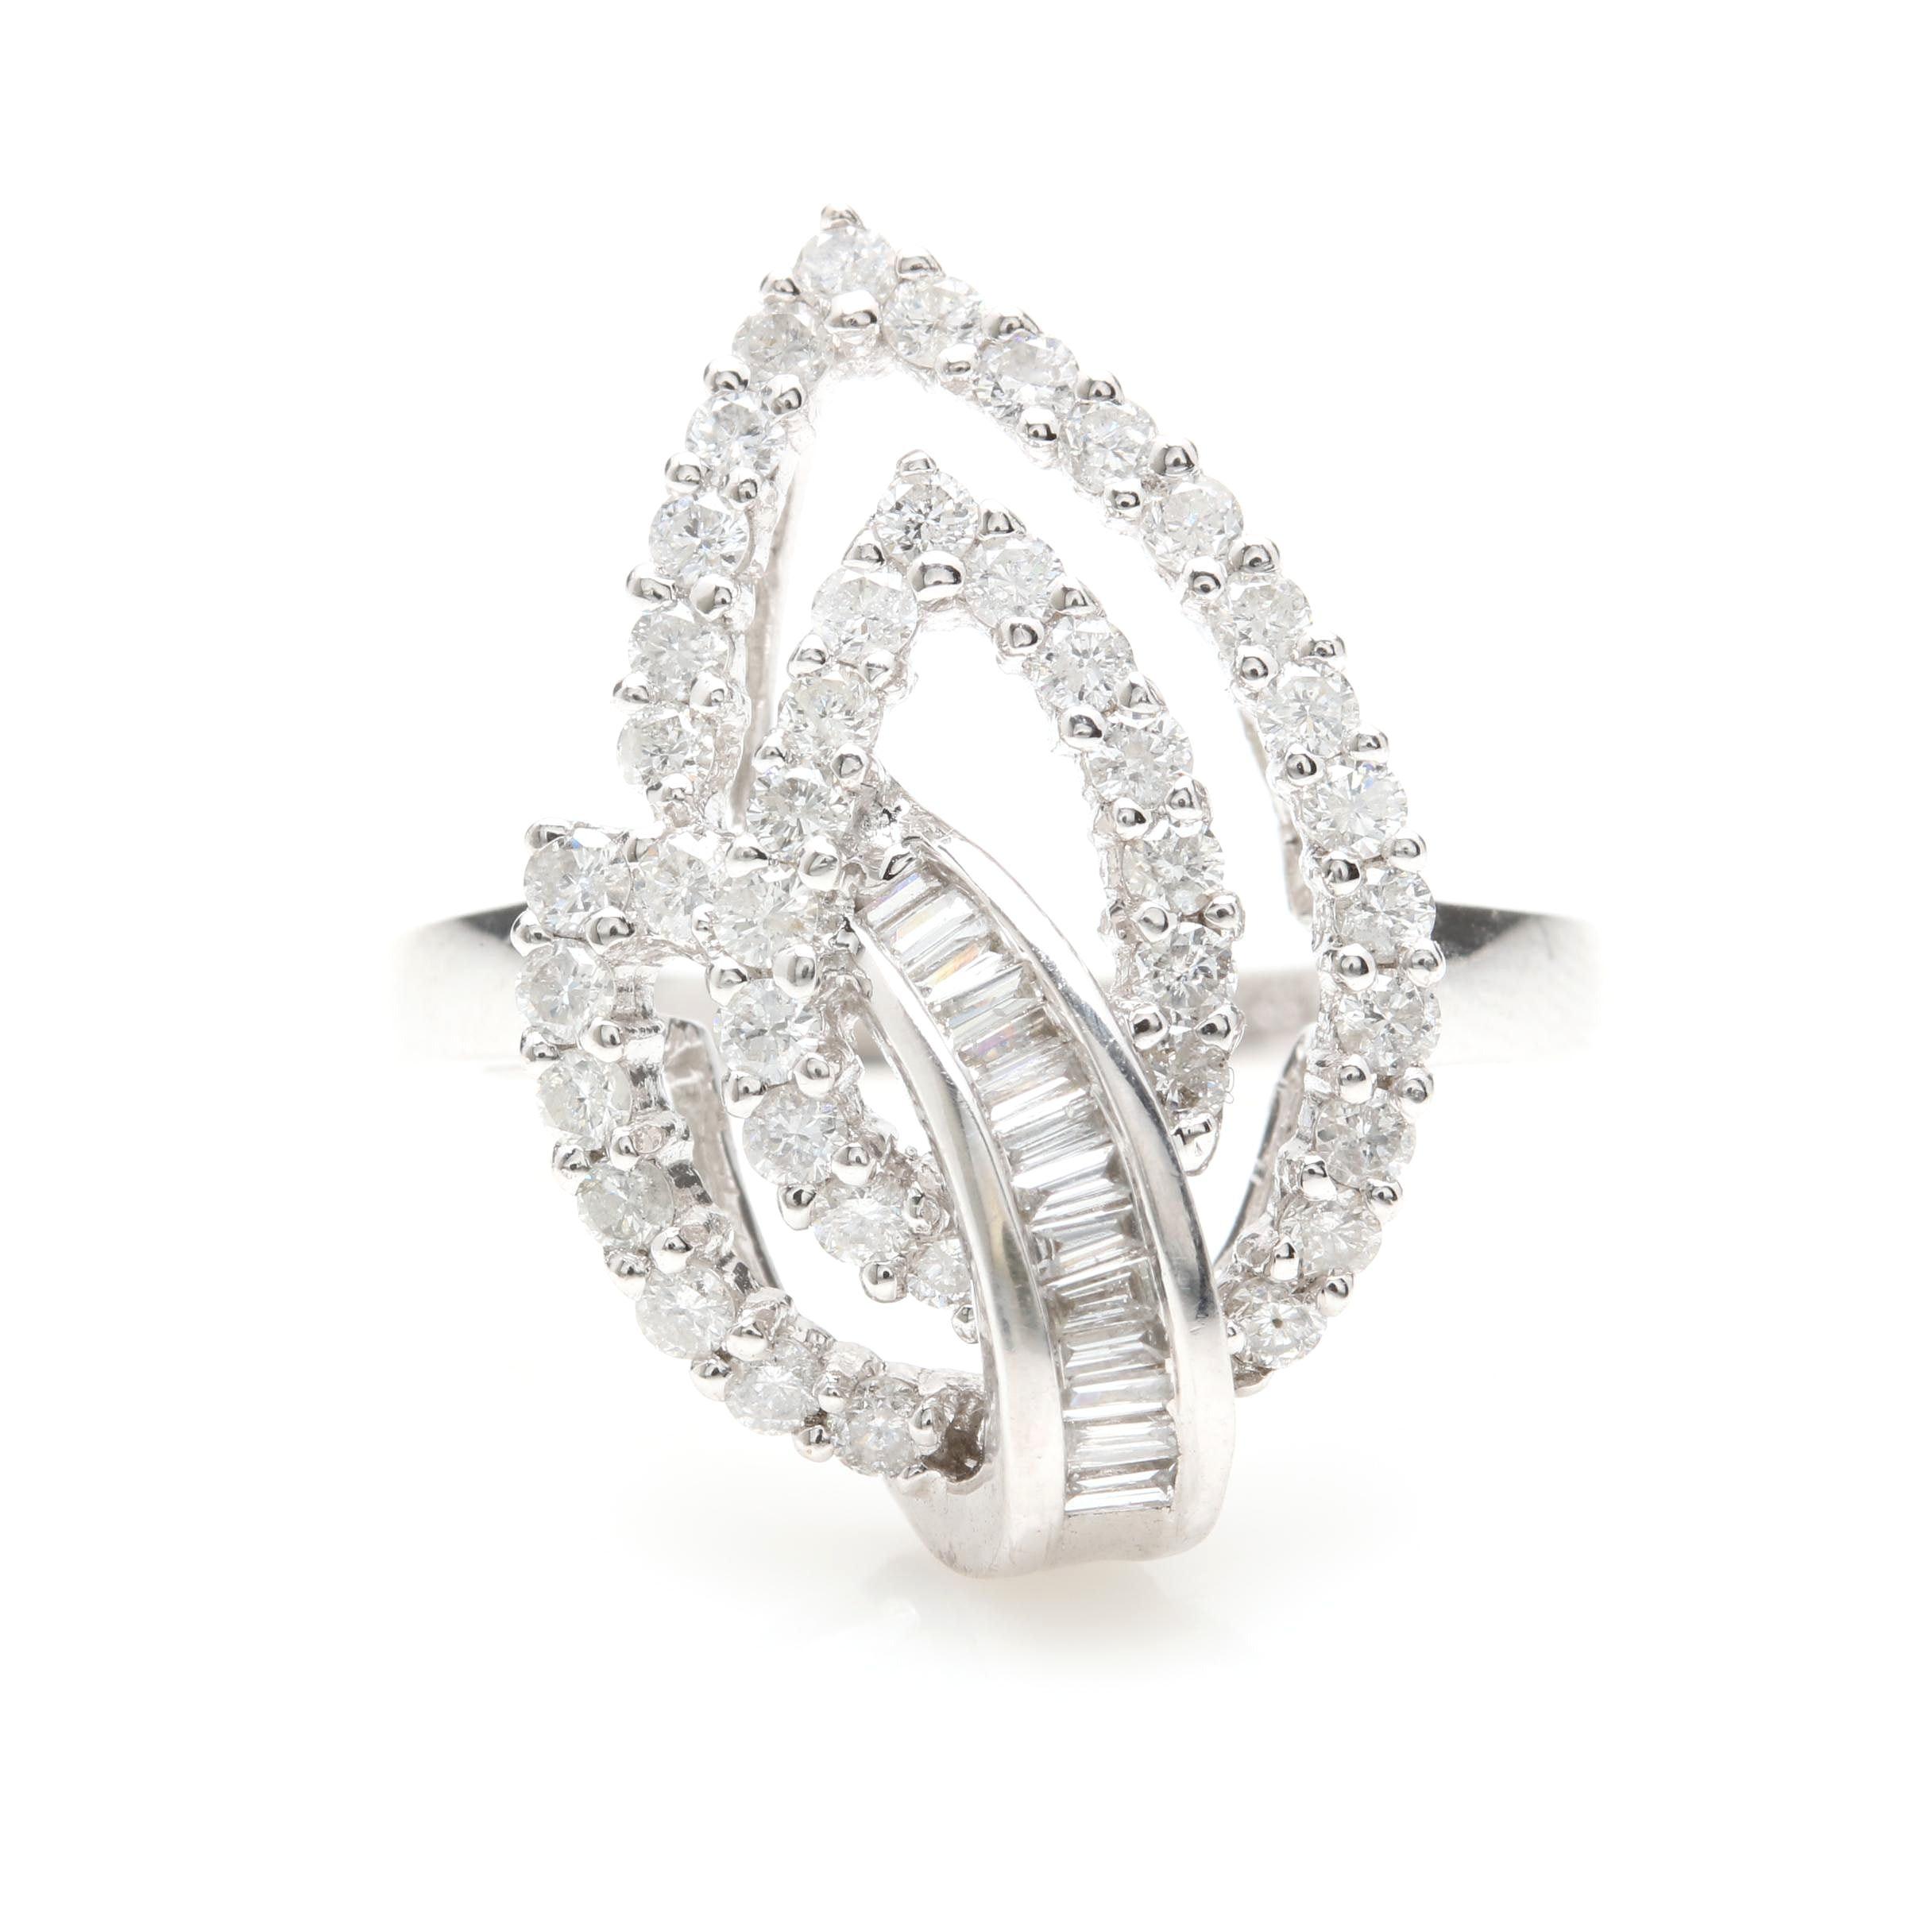 14K White Gold 0.76 CTW Diamond Ring